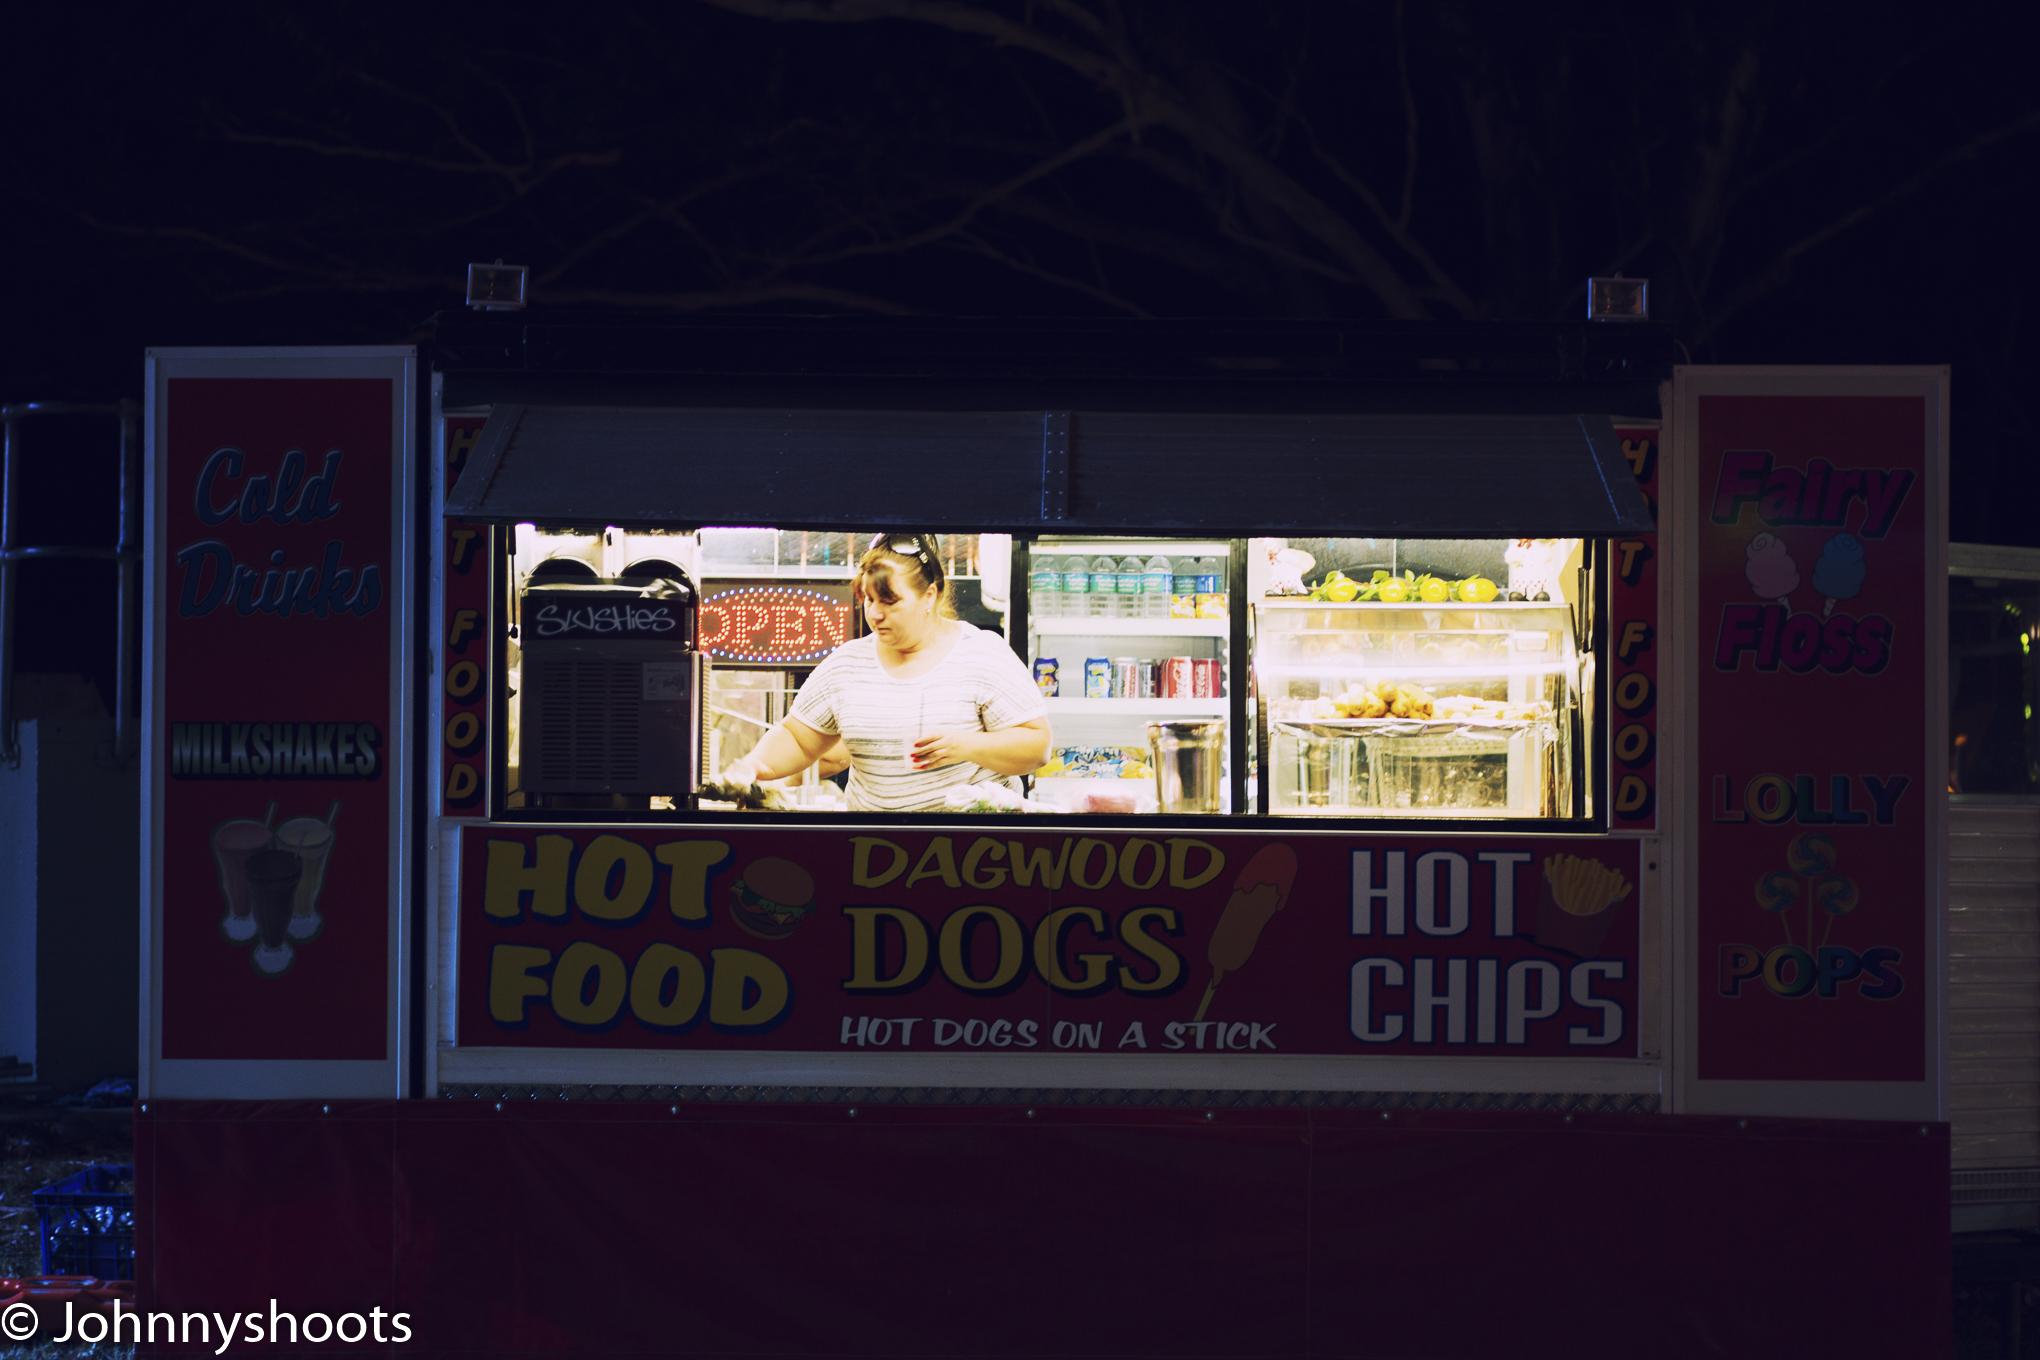 Cross process hot dogs